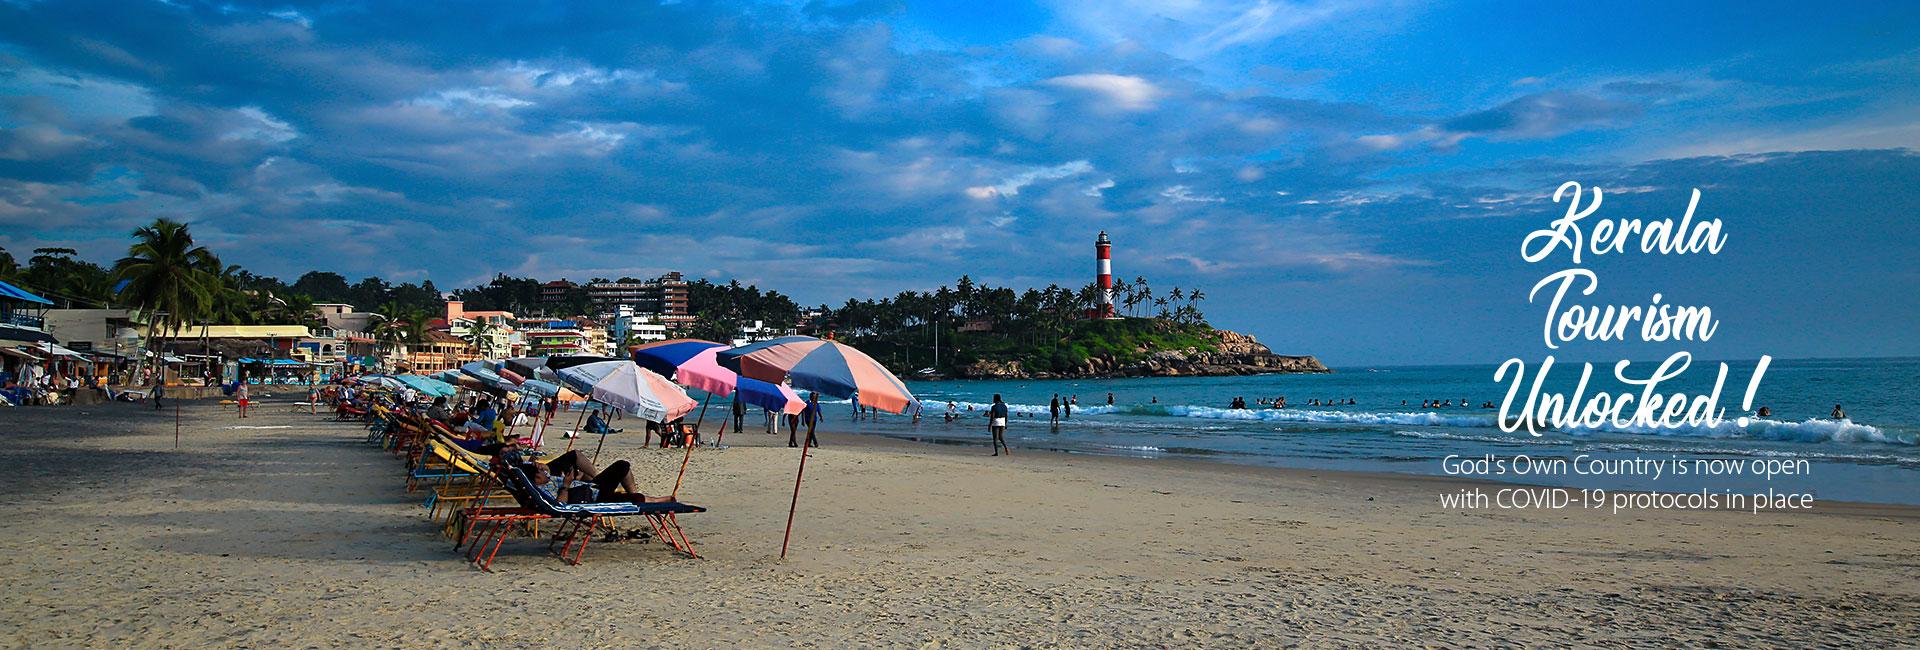 Kerala Tourism Unlocked